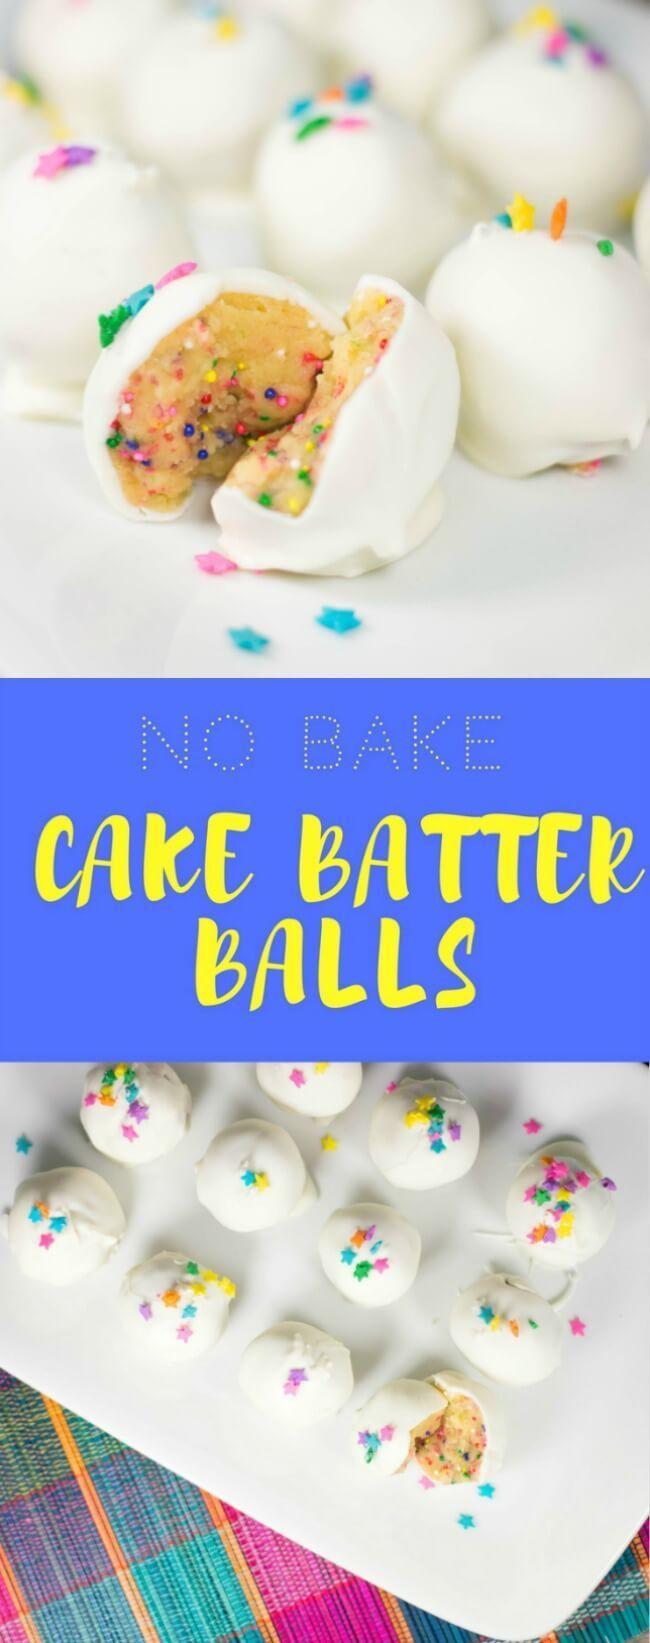 NO BAKE CAKE BATTER BALLS - This no bake cake batter balls recipe is fun, easy to make, and everyone always loves these! They taste like little bites of birthday cake!  #cake #cakeballs #dessert